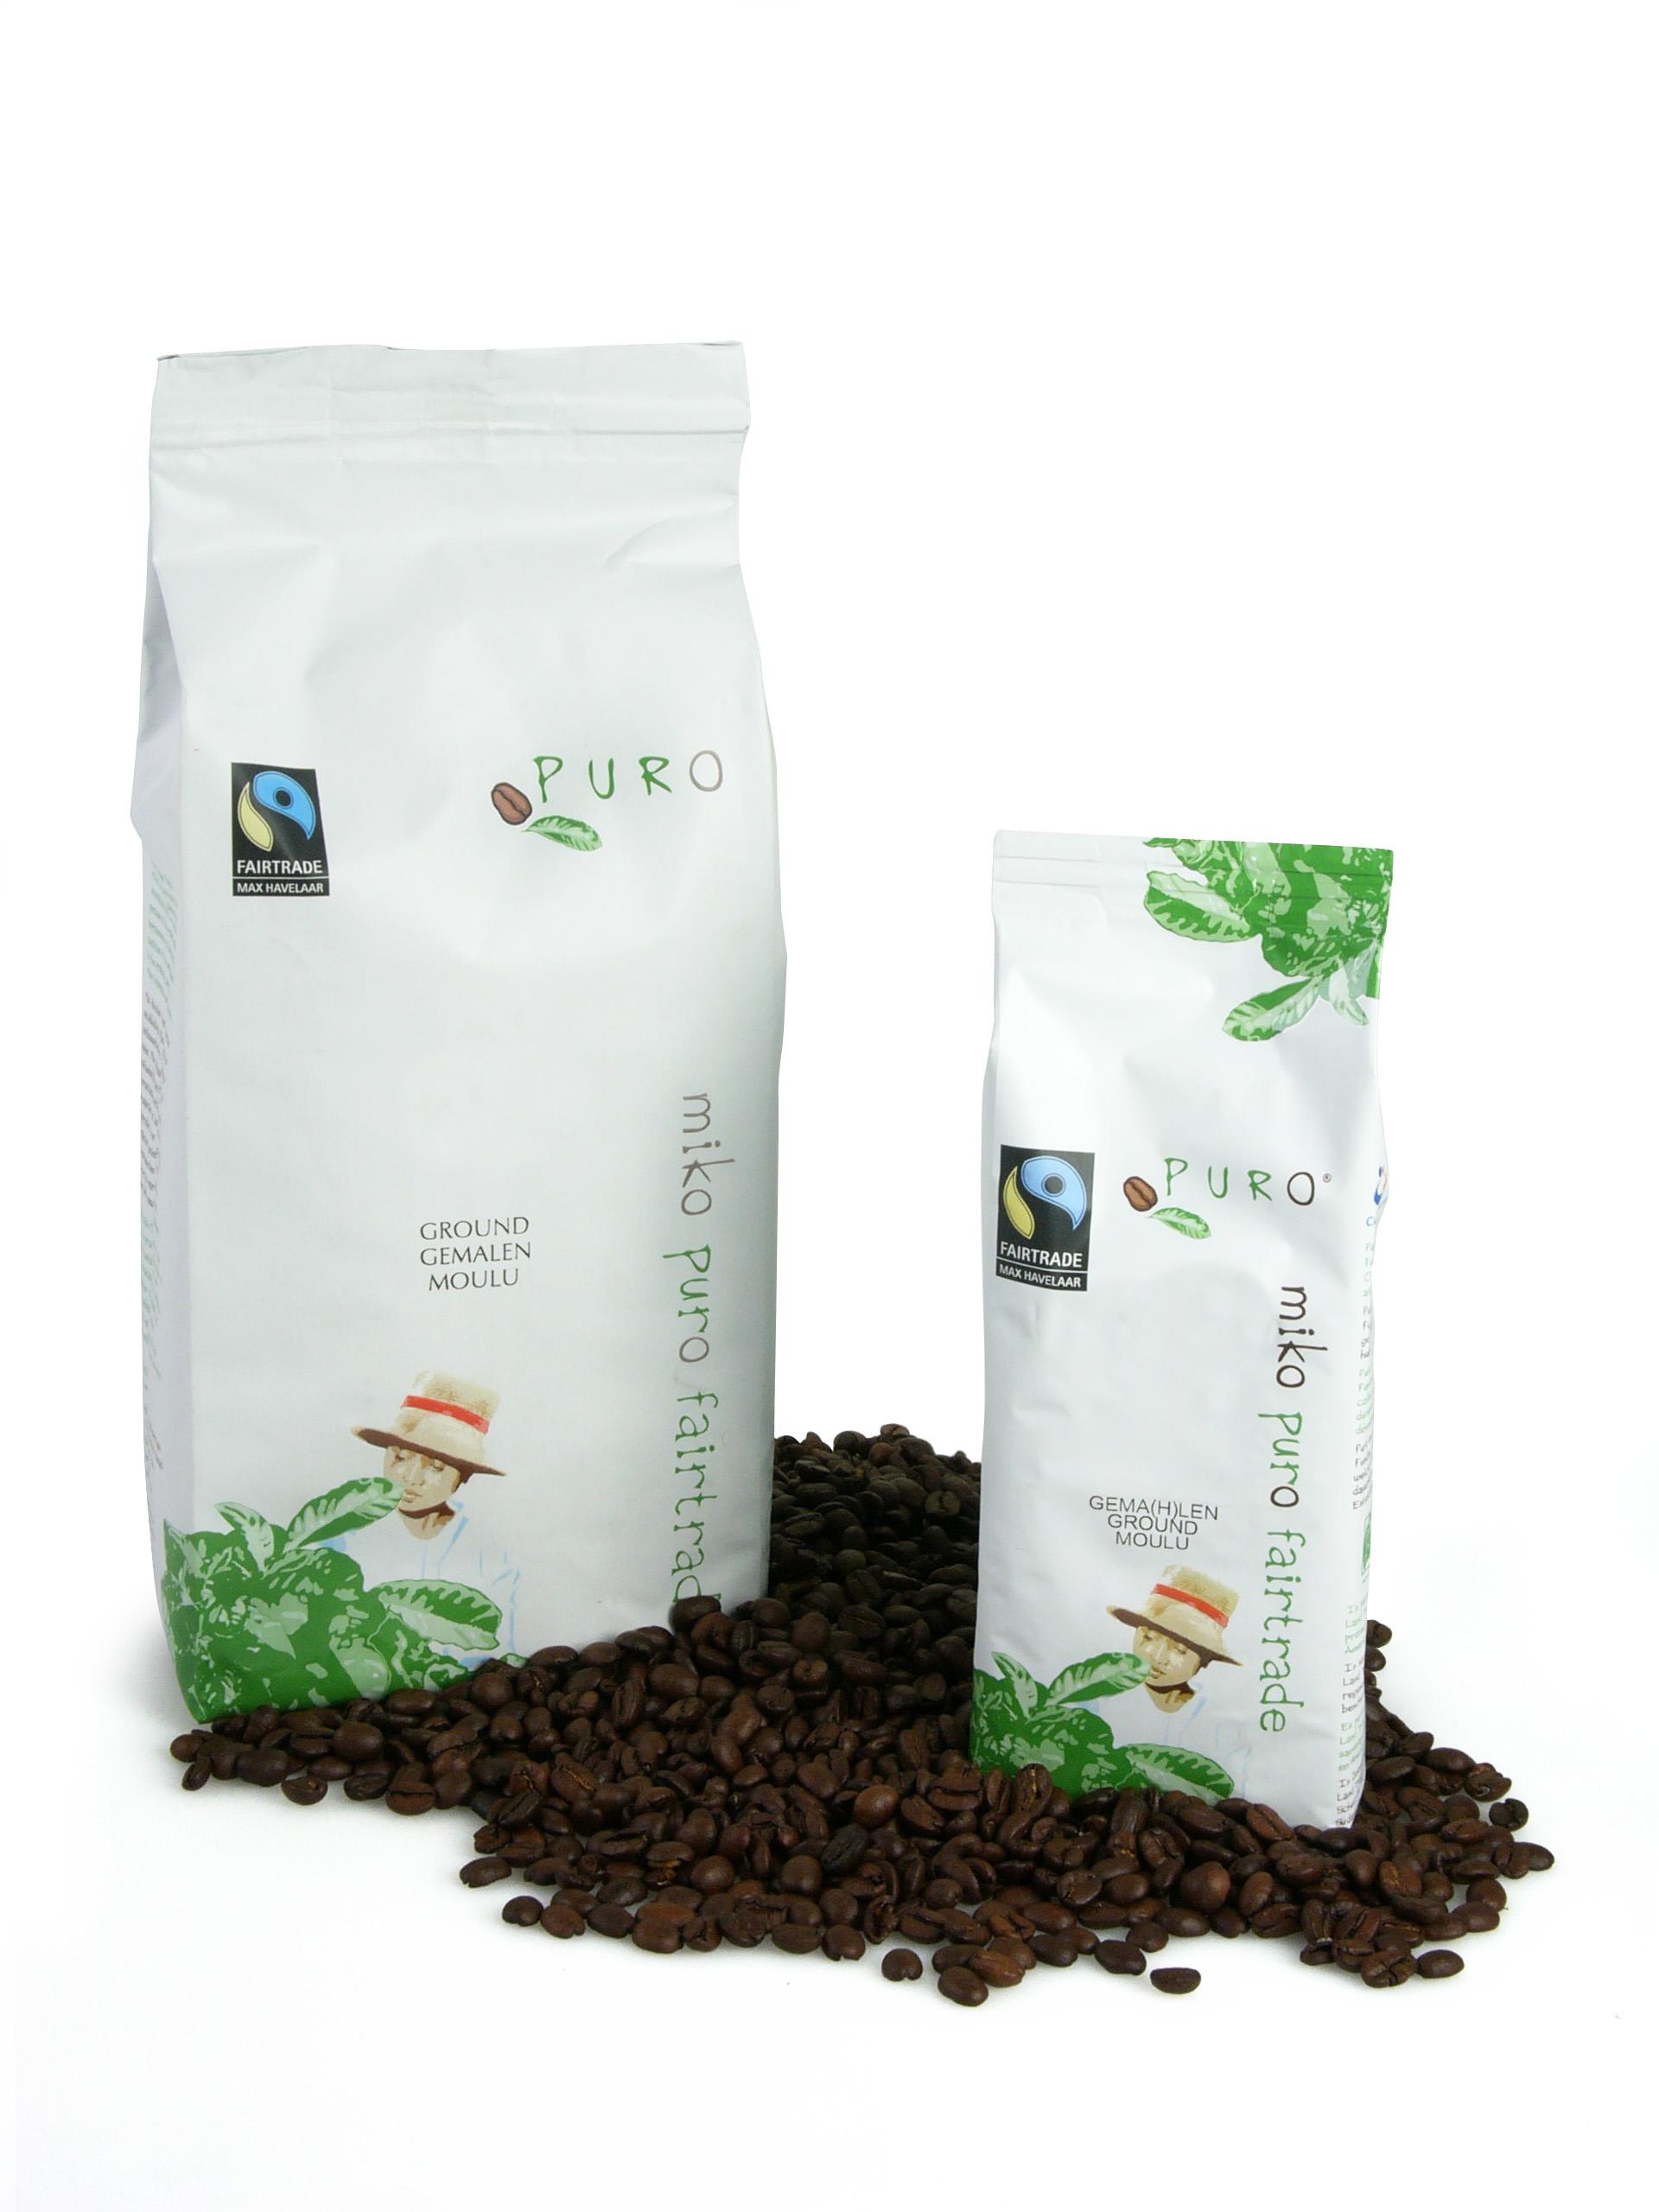 Puro Coffee Bags